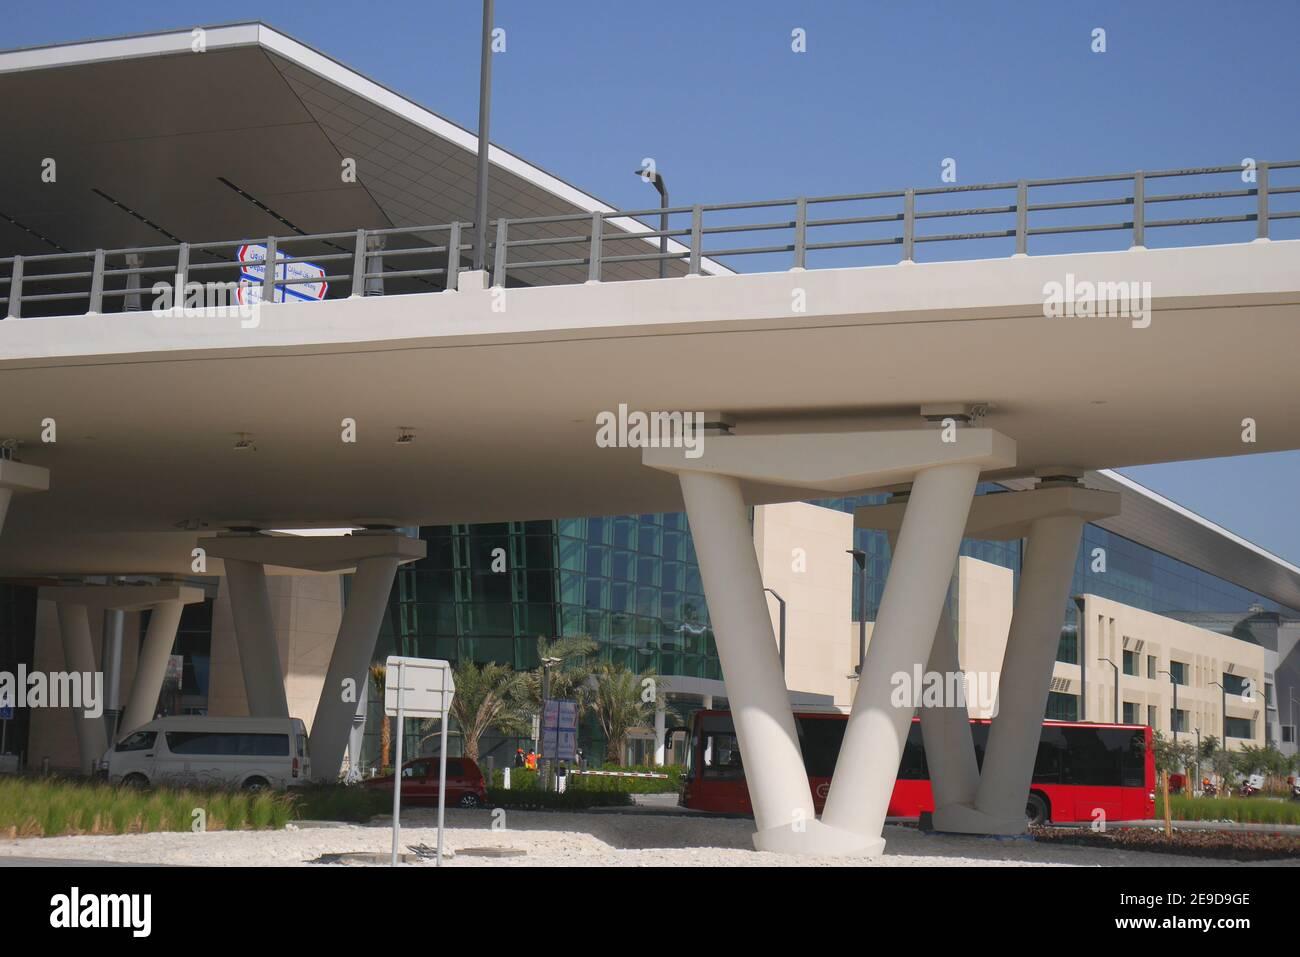 The new passenger terminal building, Bahrain International Airport, Muharraq, Kingdom of Bahrain Stock Photo